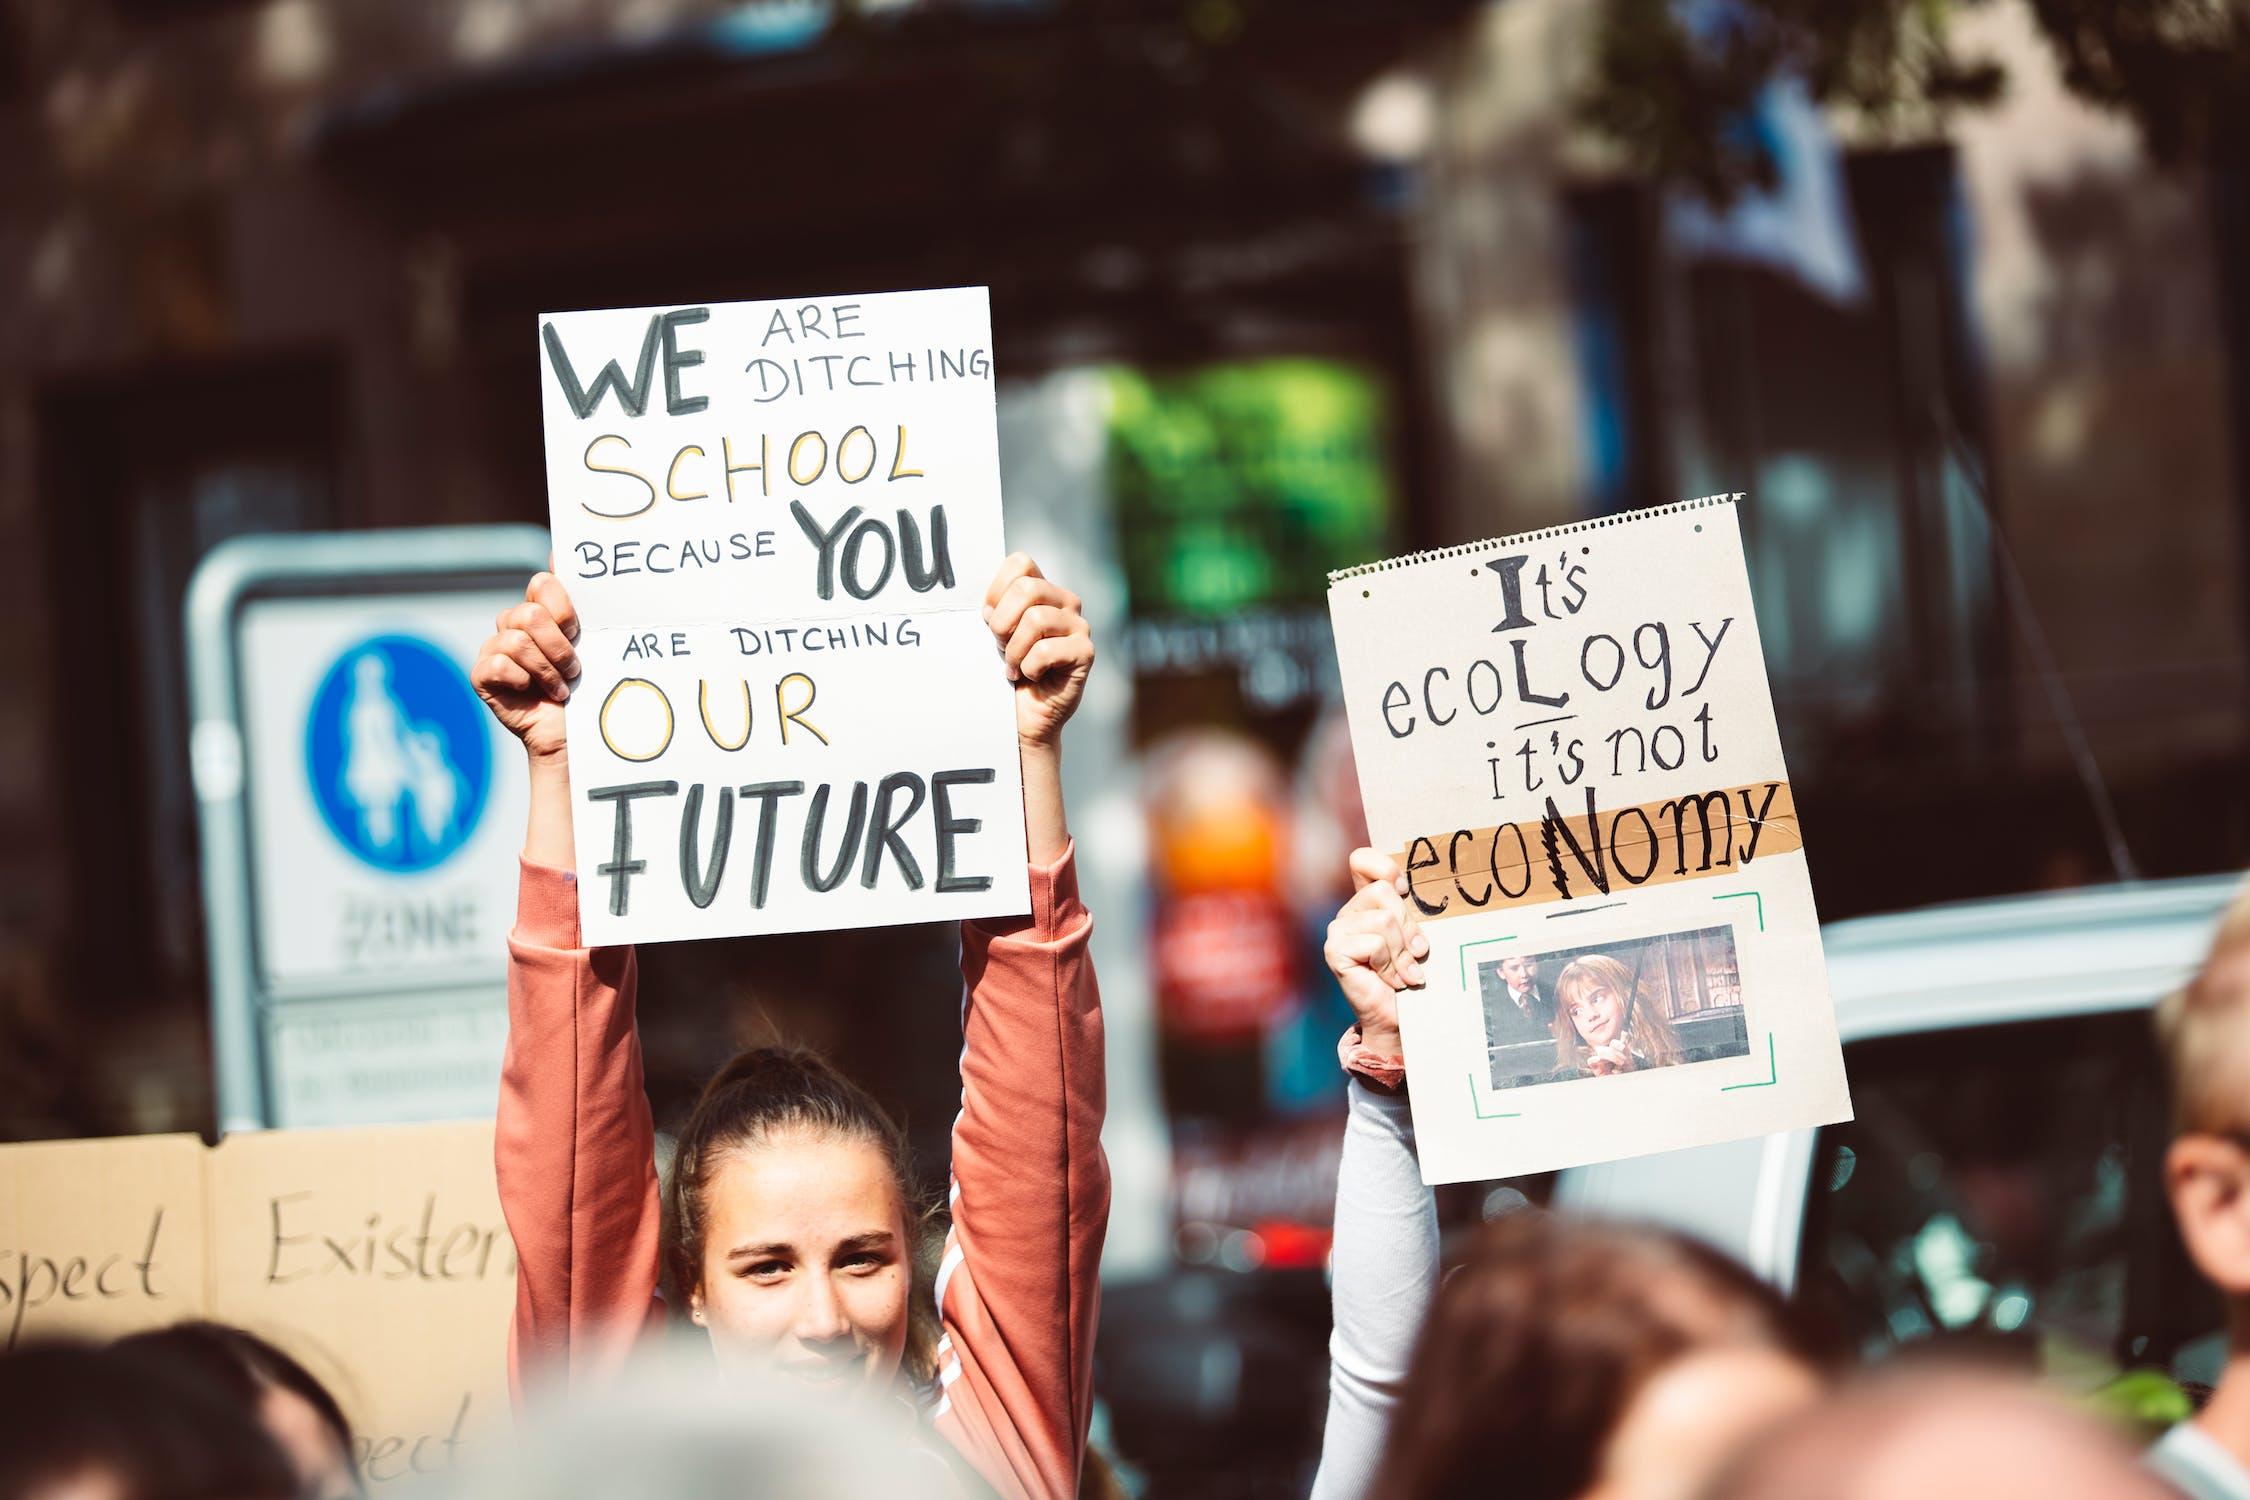 Disputes About Climate Change Splits Generations